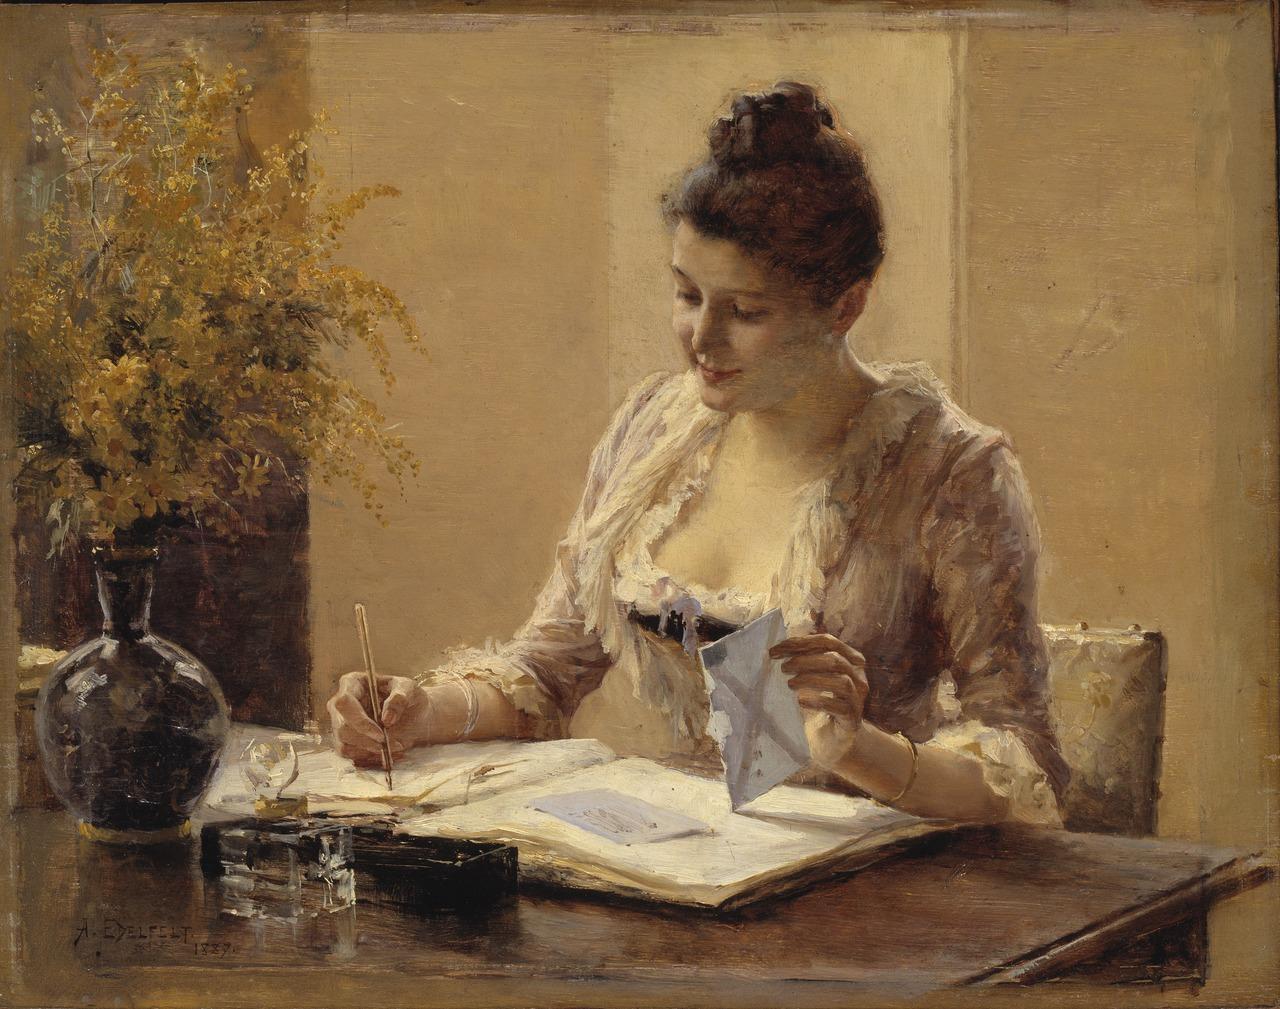 FotoAlbert Edelfelt Lady Writing a Letter (Public Domain)